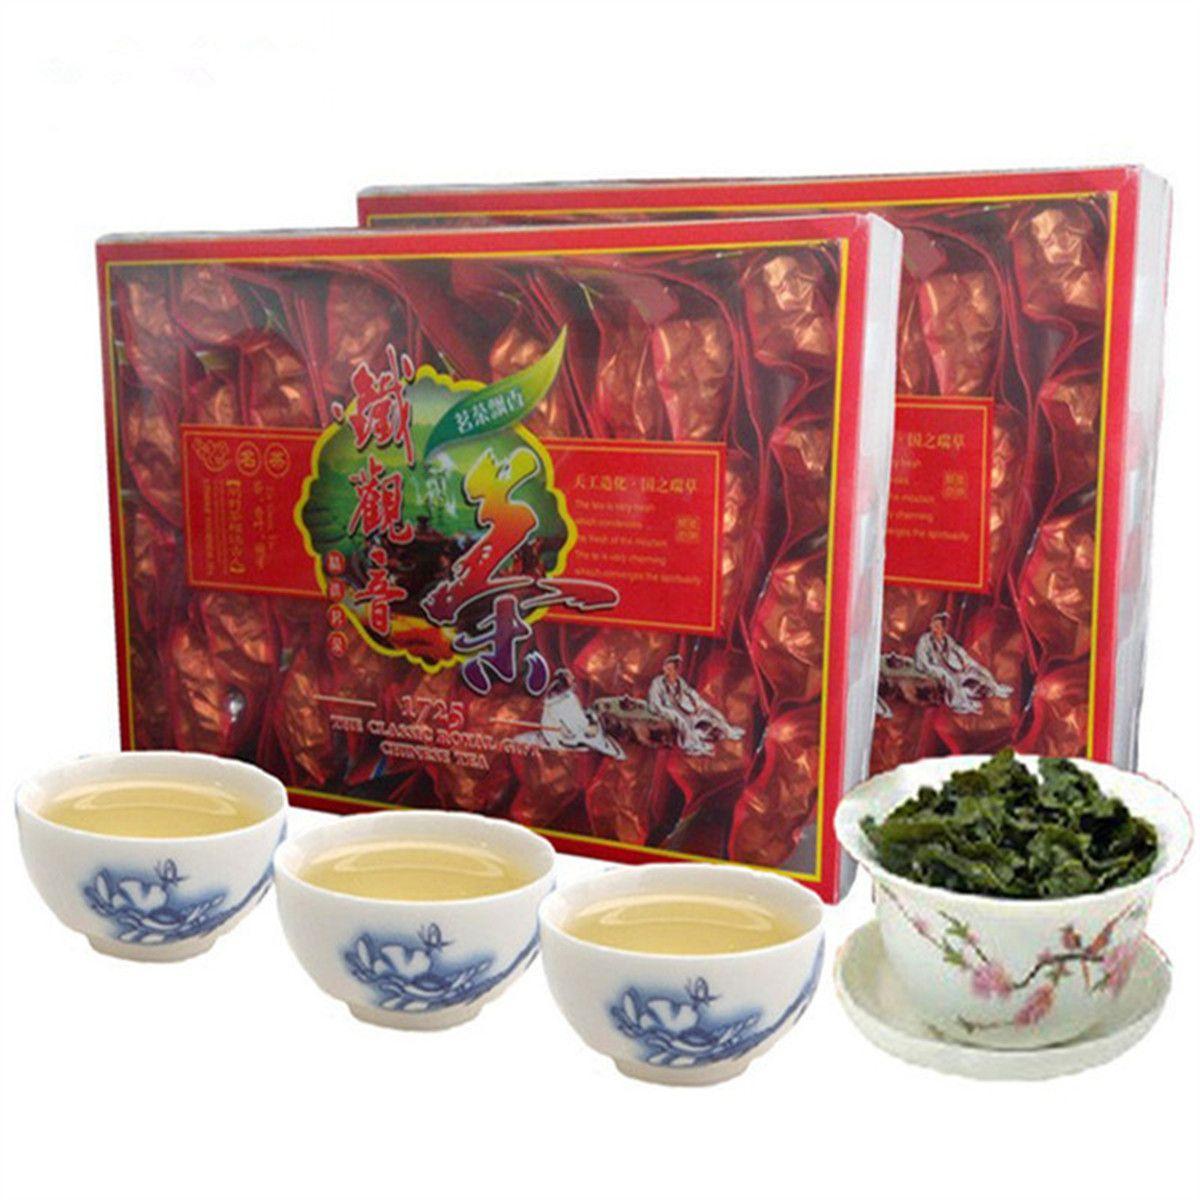 250g Çin Organik Oolong Çay Tayvan Yüksek Dağları Yeni Bahar Oolong Çay Tikuanyin çay Yeşil Gıda Kutulu Sıcak satış